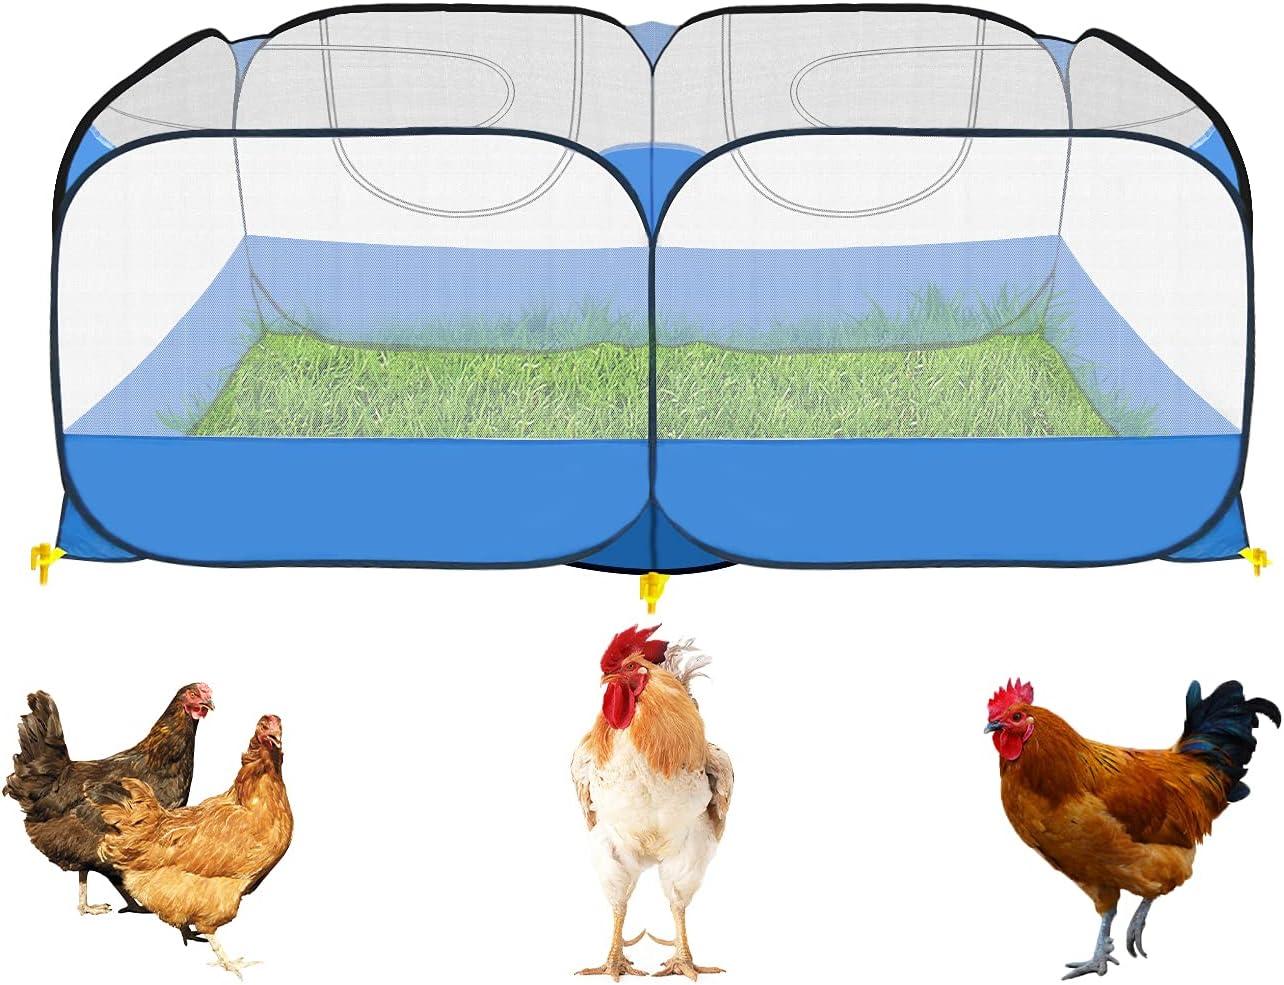 GABraden Portable Small Animals Playpen Chicken Run coop,Chicken Pen for Small Animals Outdoor Pet Enclosure Outdoor(Navy Blue)